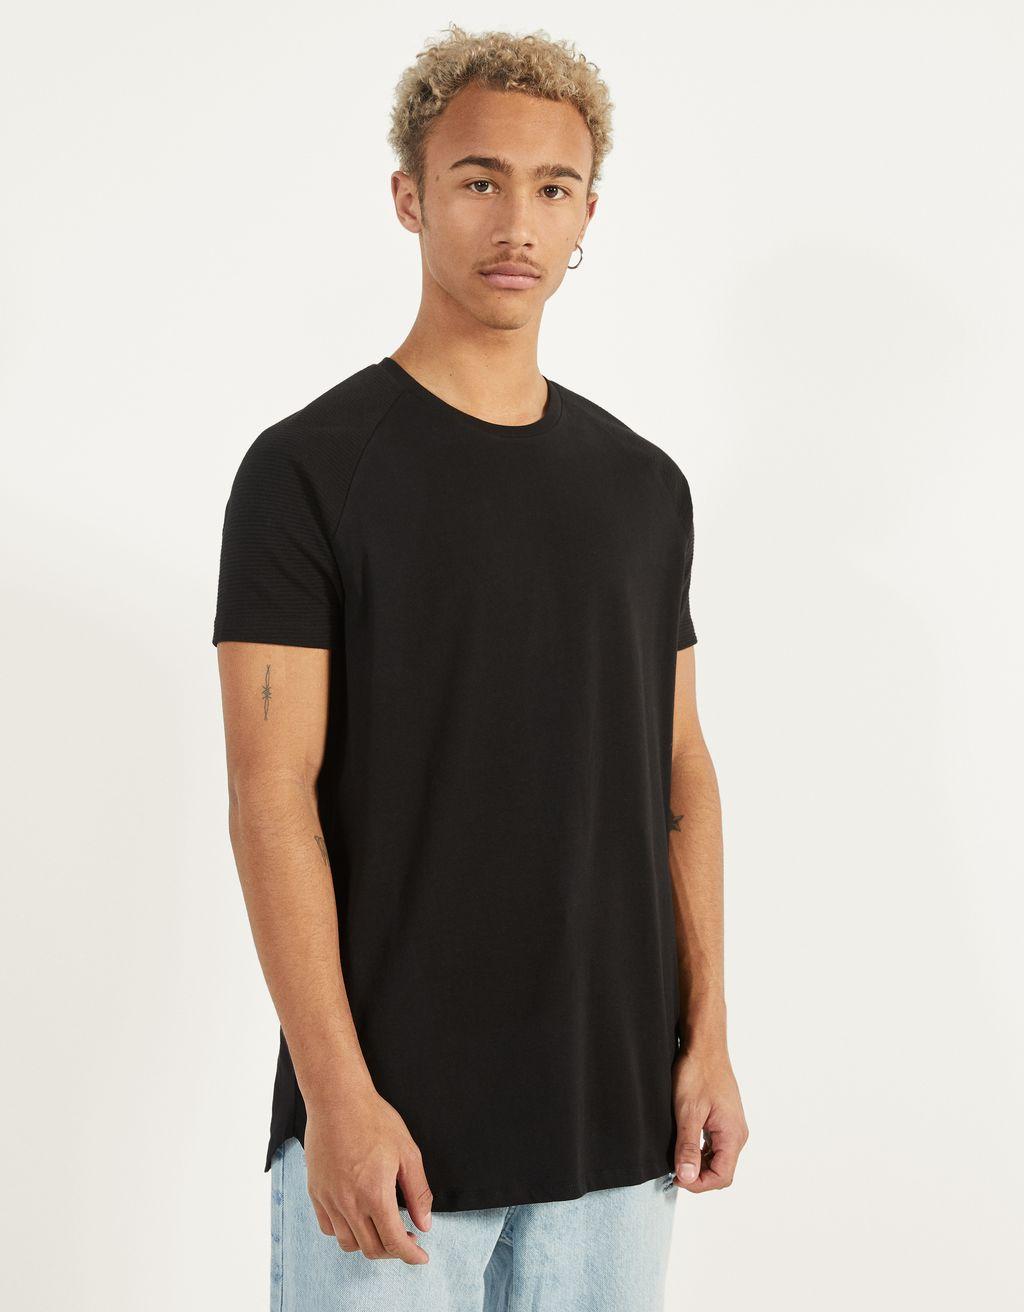 Raglan sleeve T-shirt